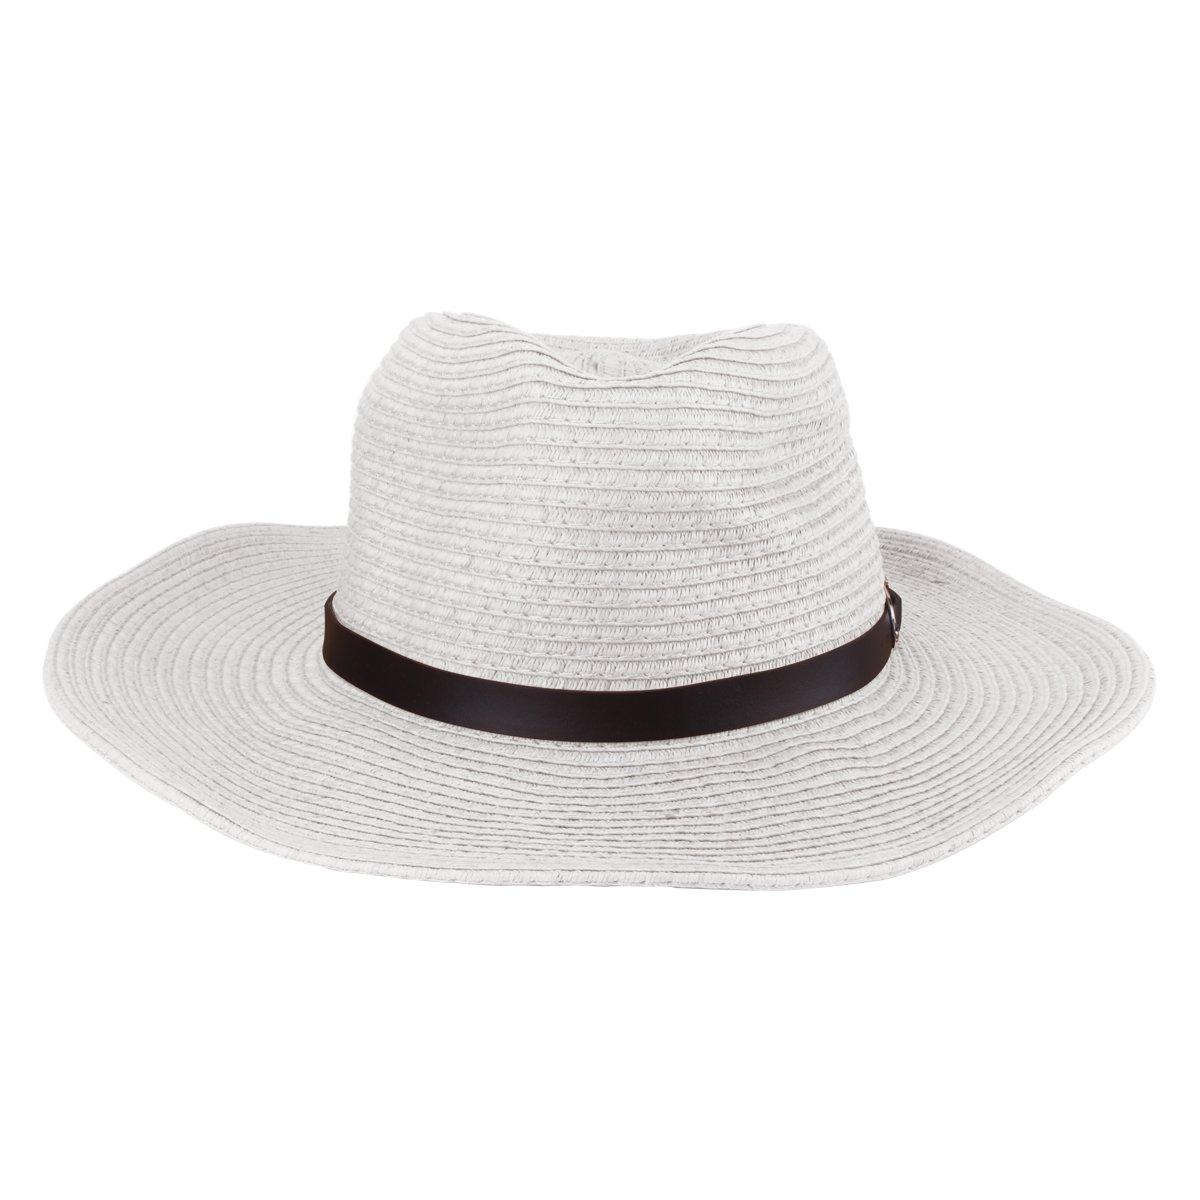 ... Mens Straw Sun Western Cowboy Hat Fedora Outdoor Wide Brim Hat with  Strap ... e494bdbff84a